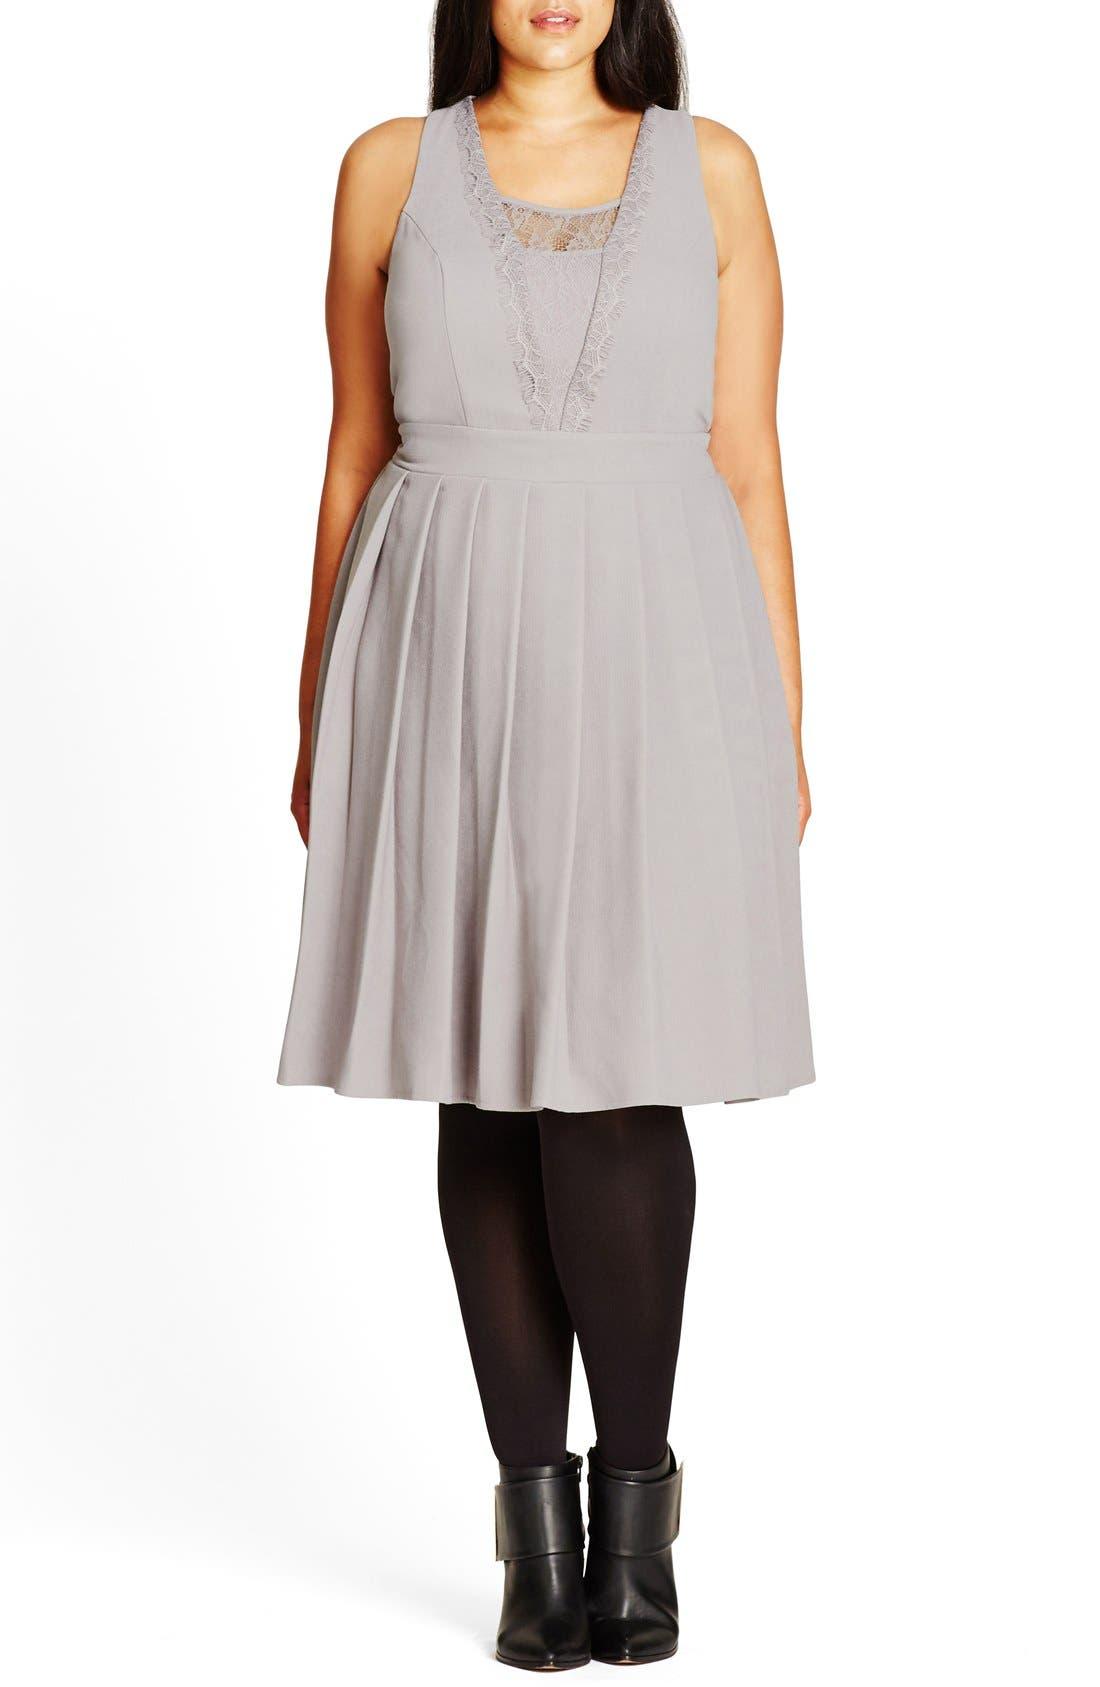 Main Image - City Chic 'Eyelash Trim' Lace Inset Pleat Fit & Flare Dress (Plus Size)